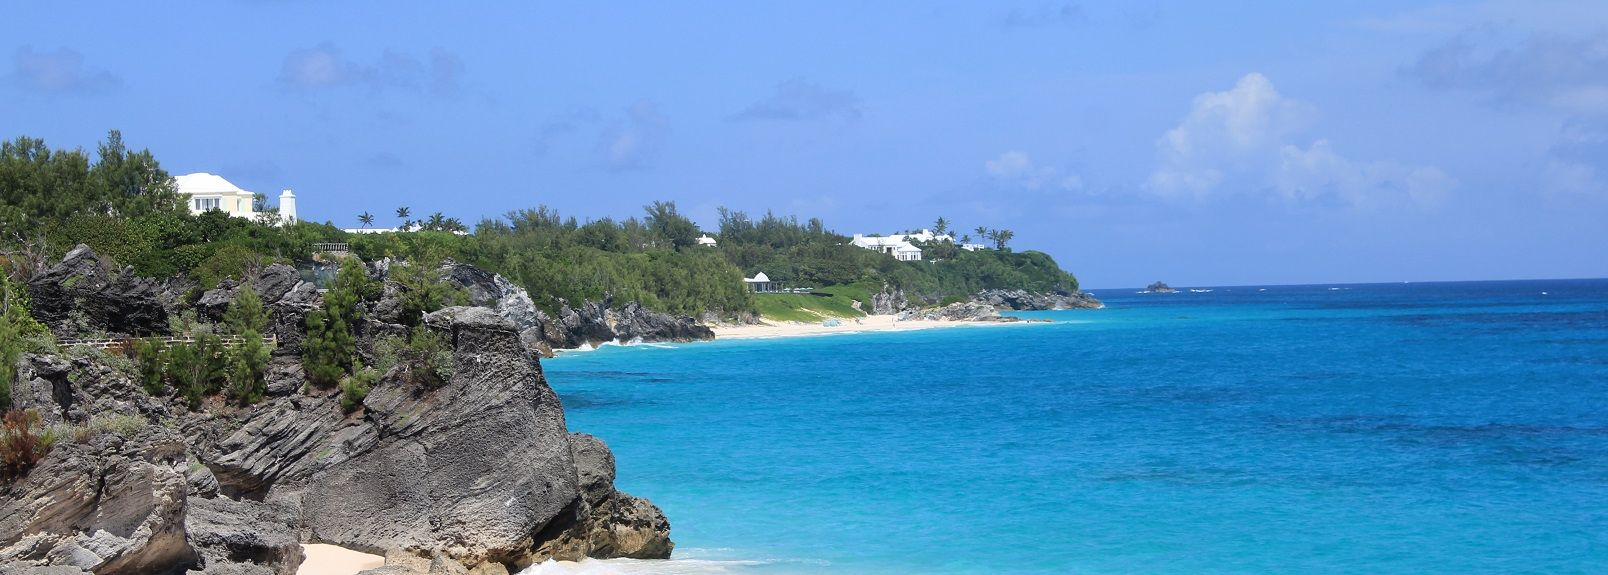 Camden House, Devonshire, Bermuda